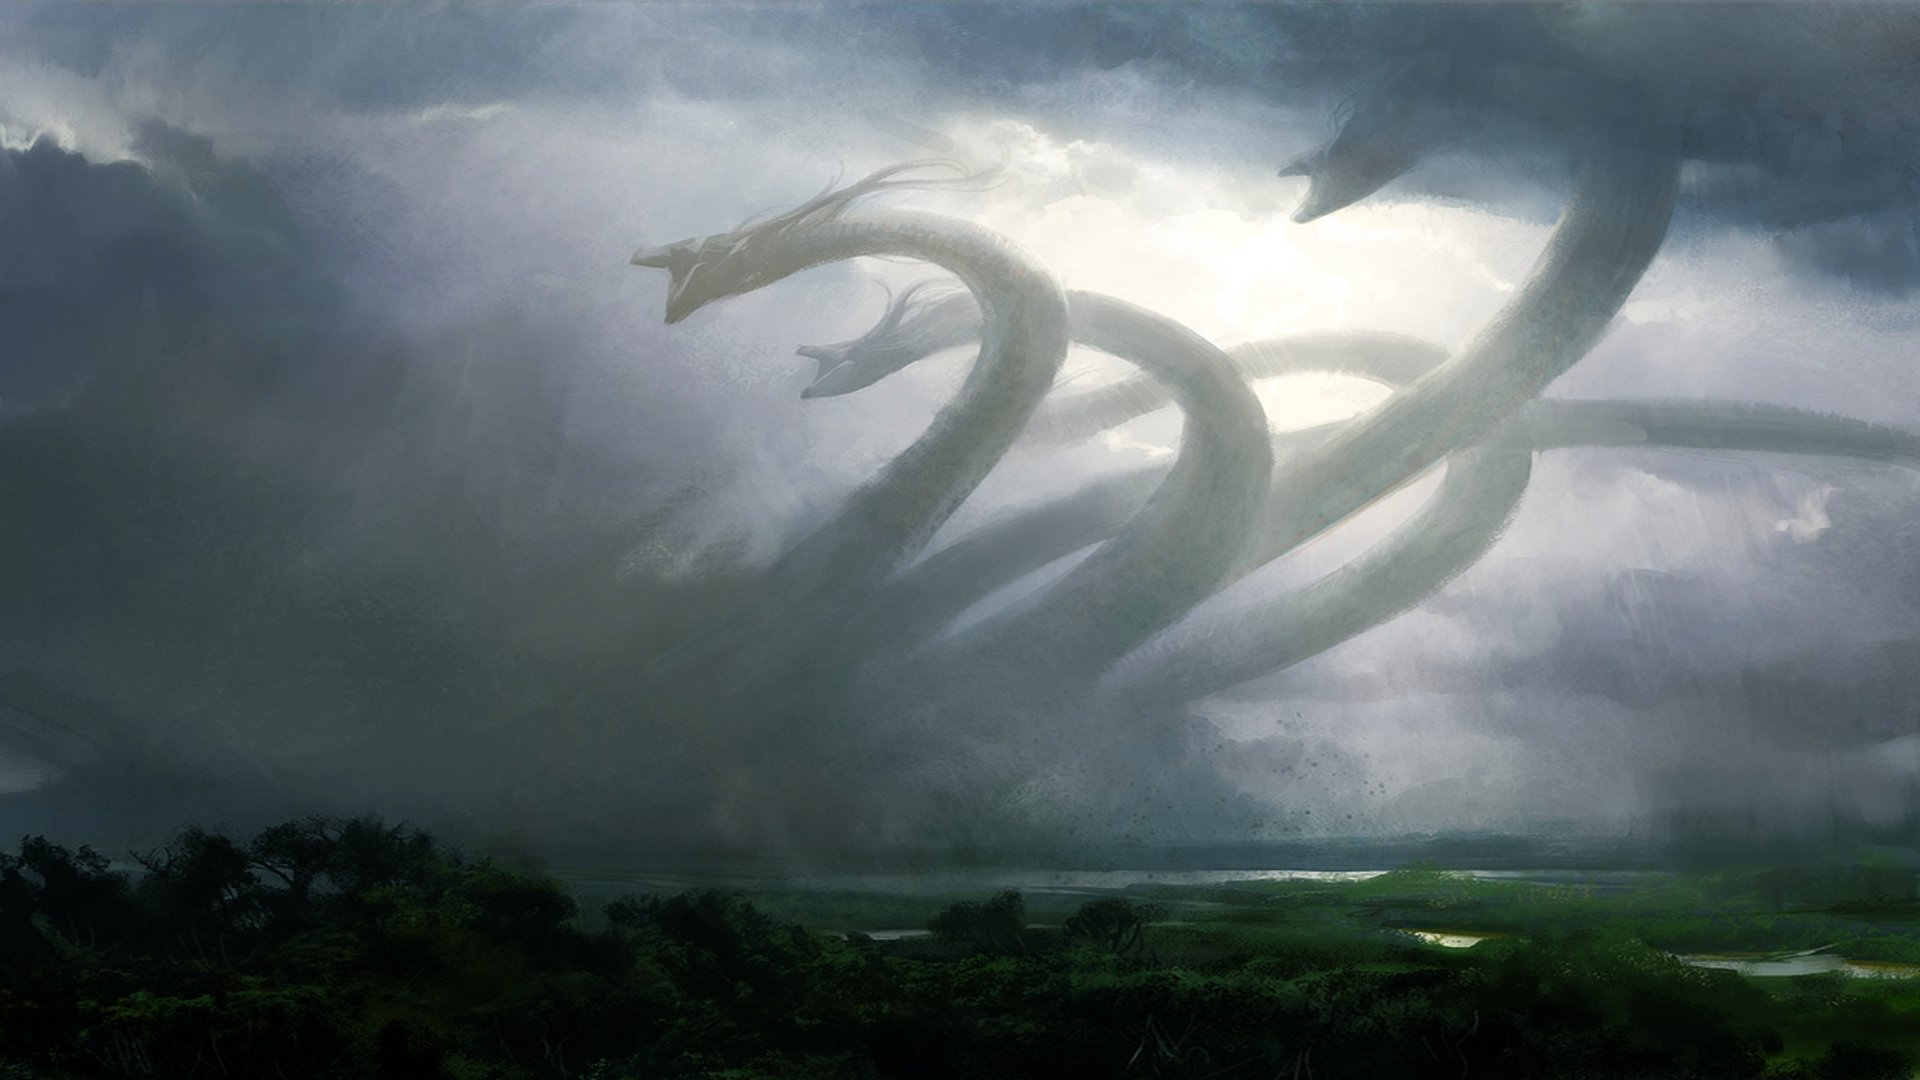 storm dragons computer wallpapers desktop backgrounds